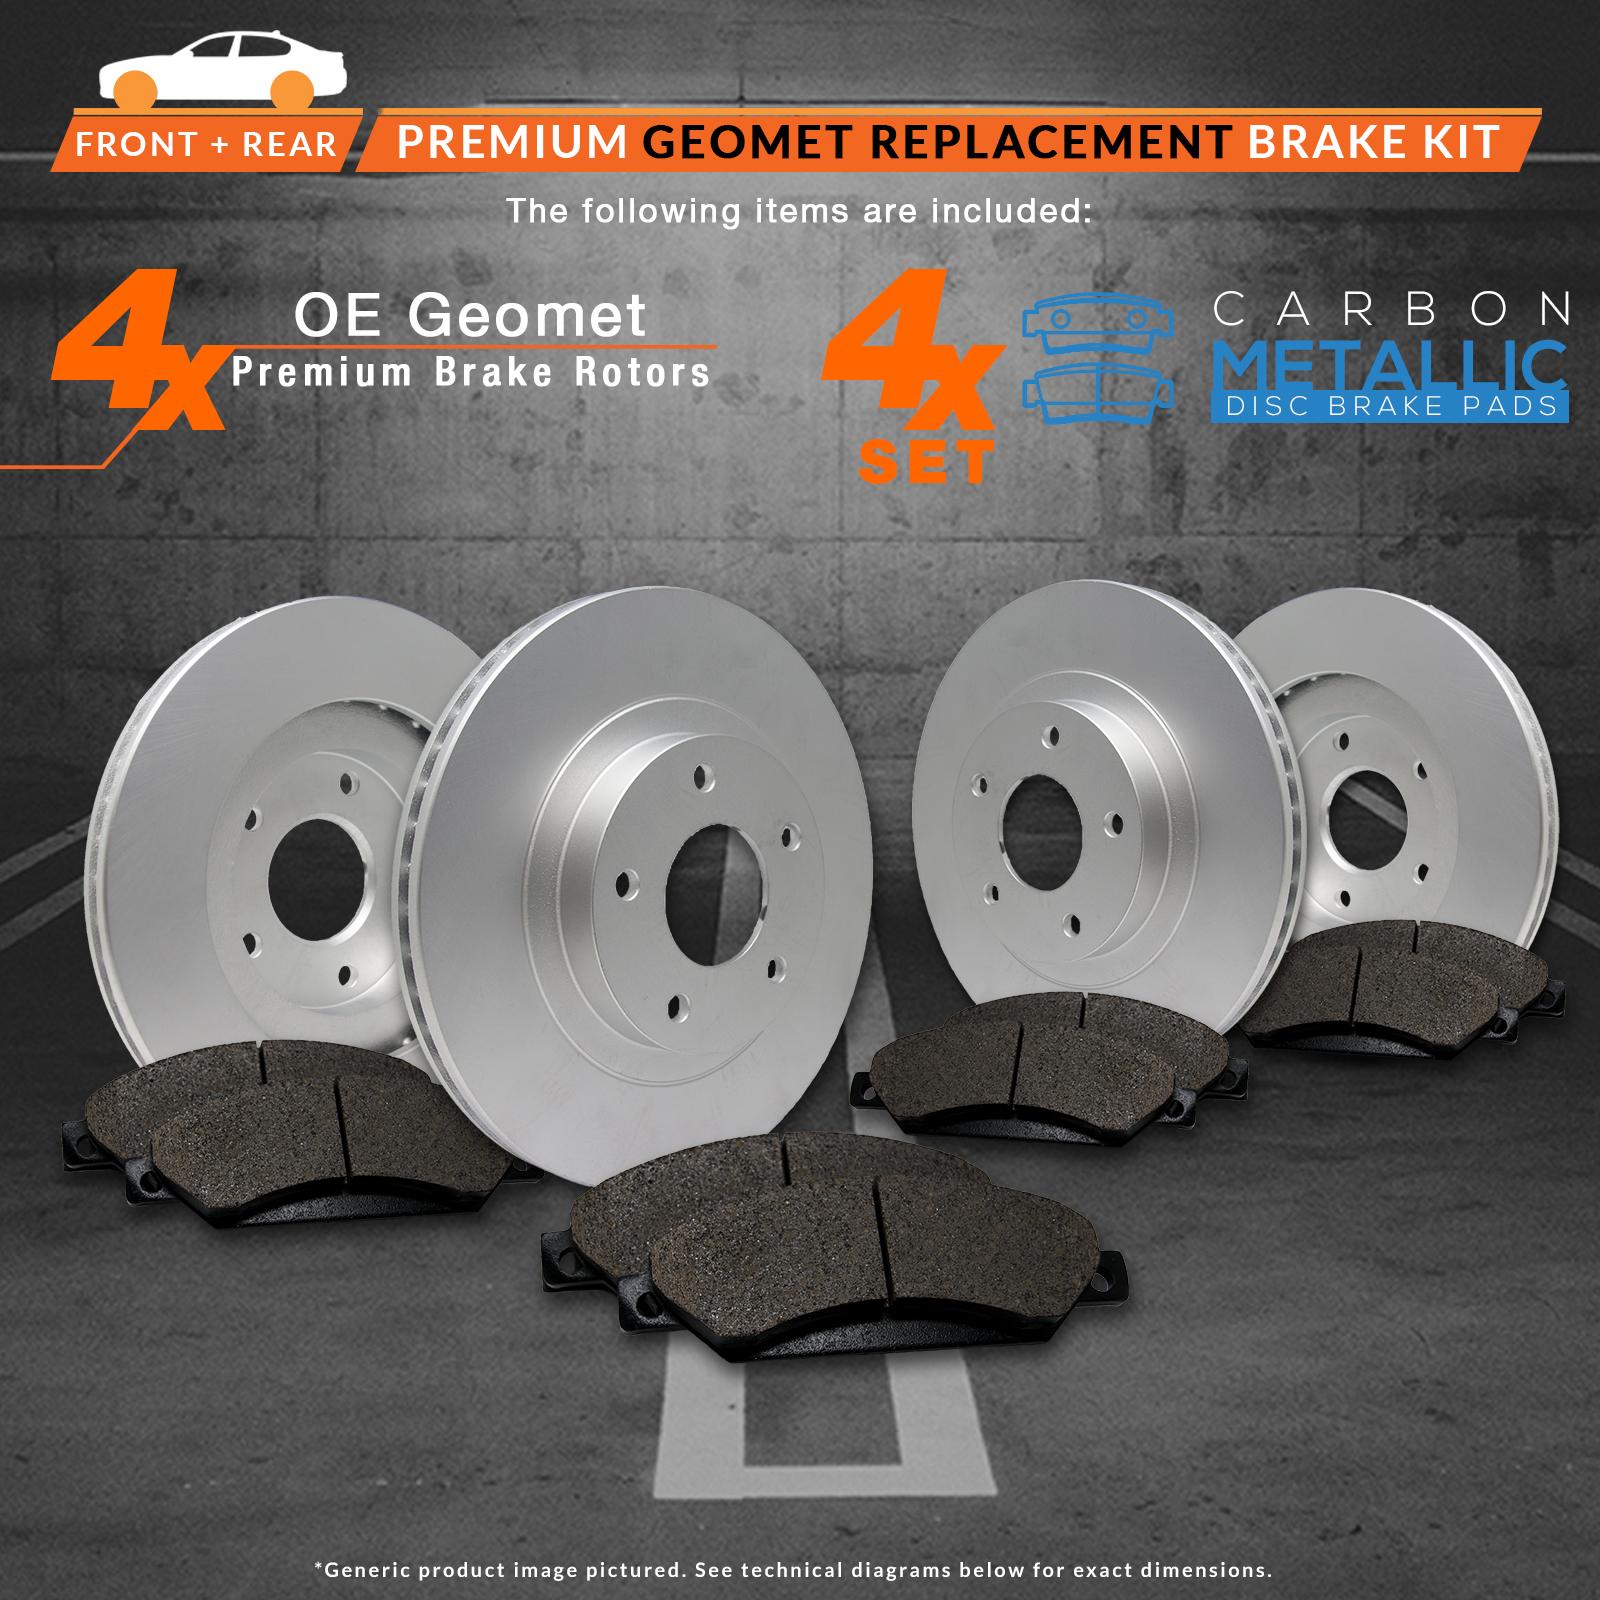 Front-Rear-Rotors-w-Metallic-Pads-Geomet-OE-Brakes-2005-Honda-Accord thumbnail 2